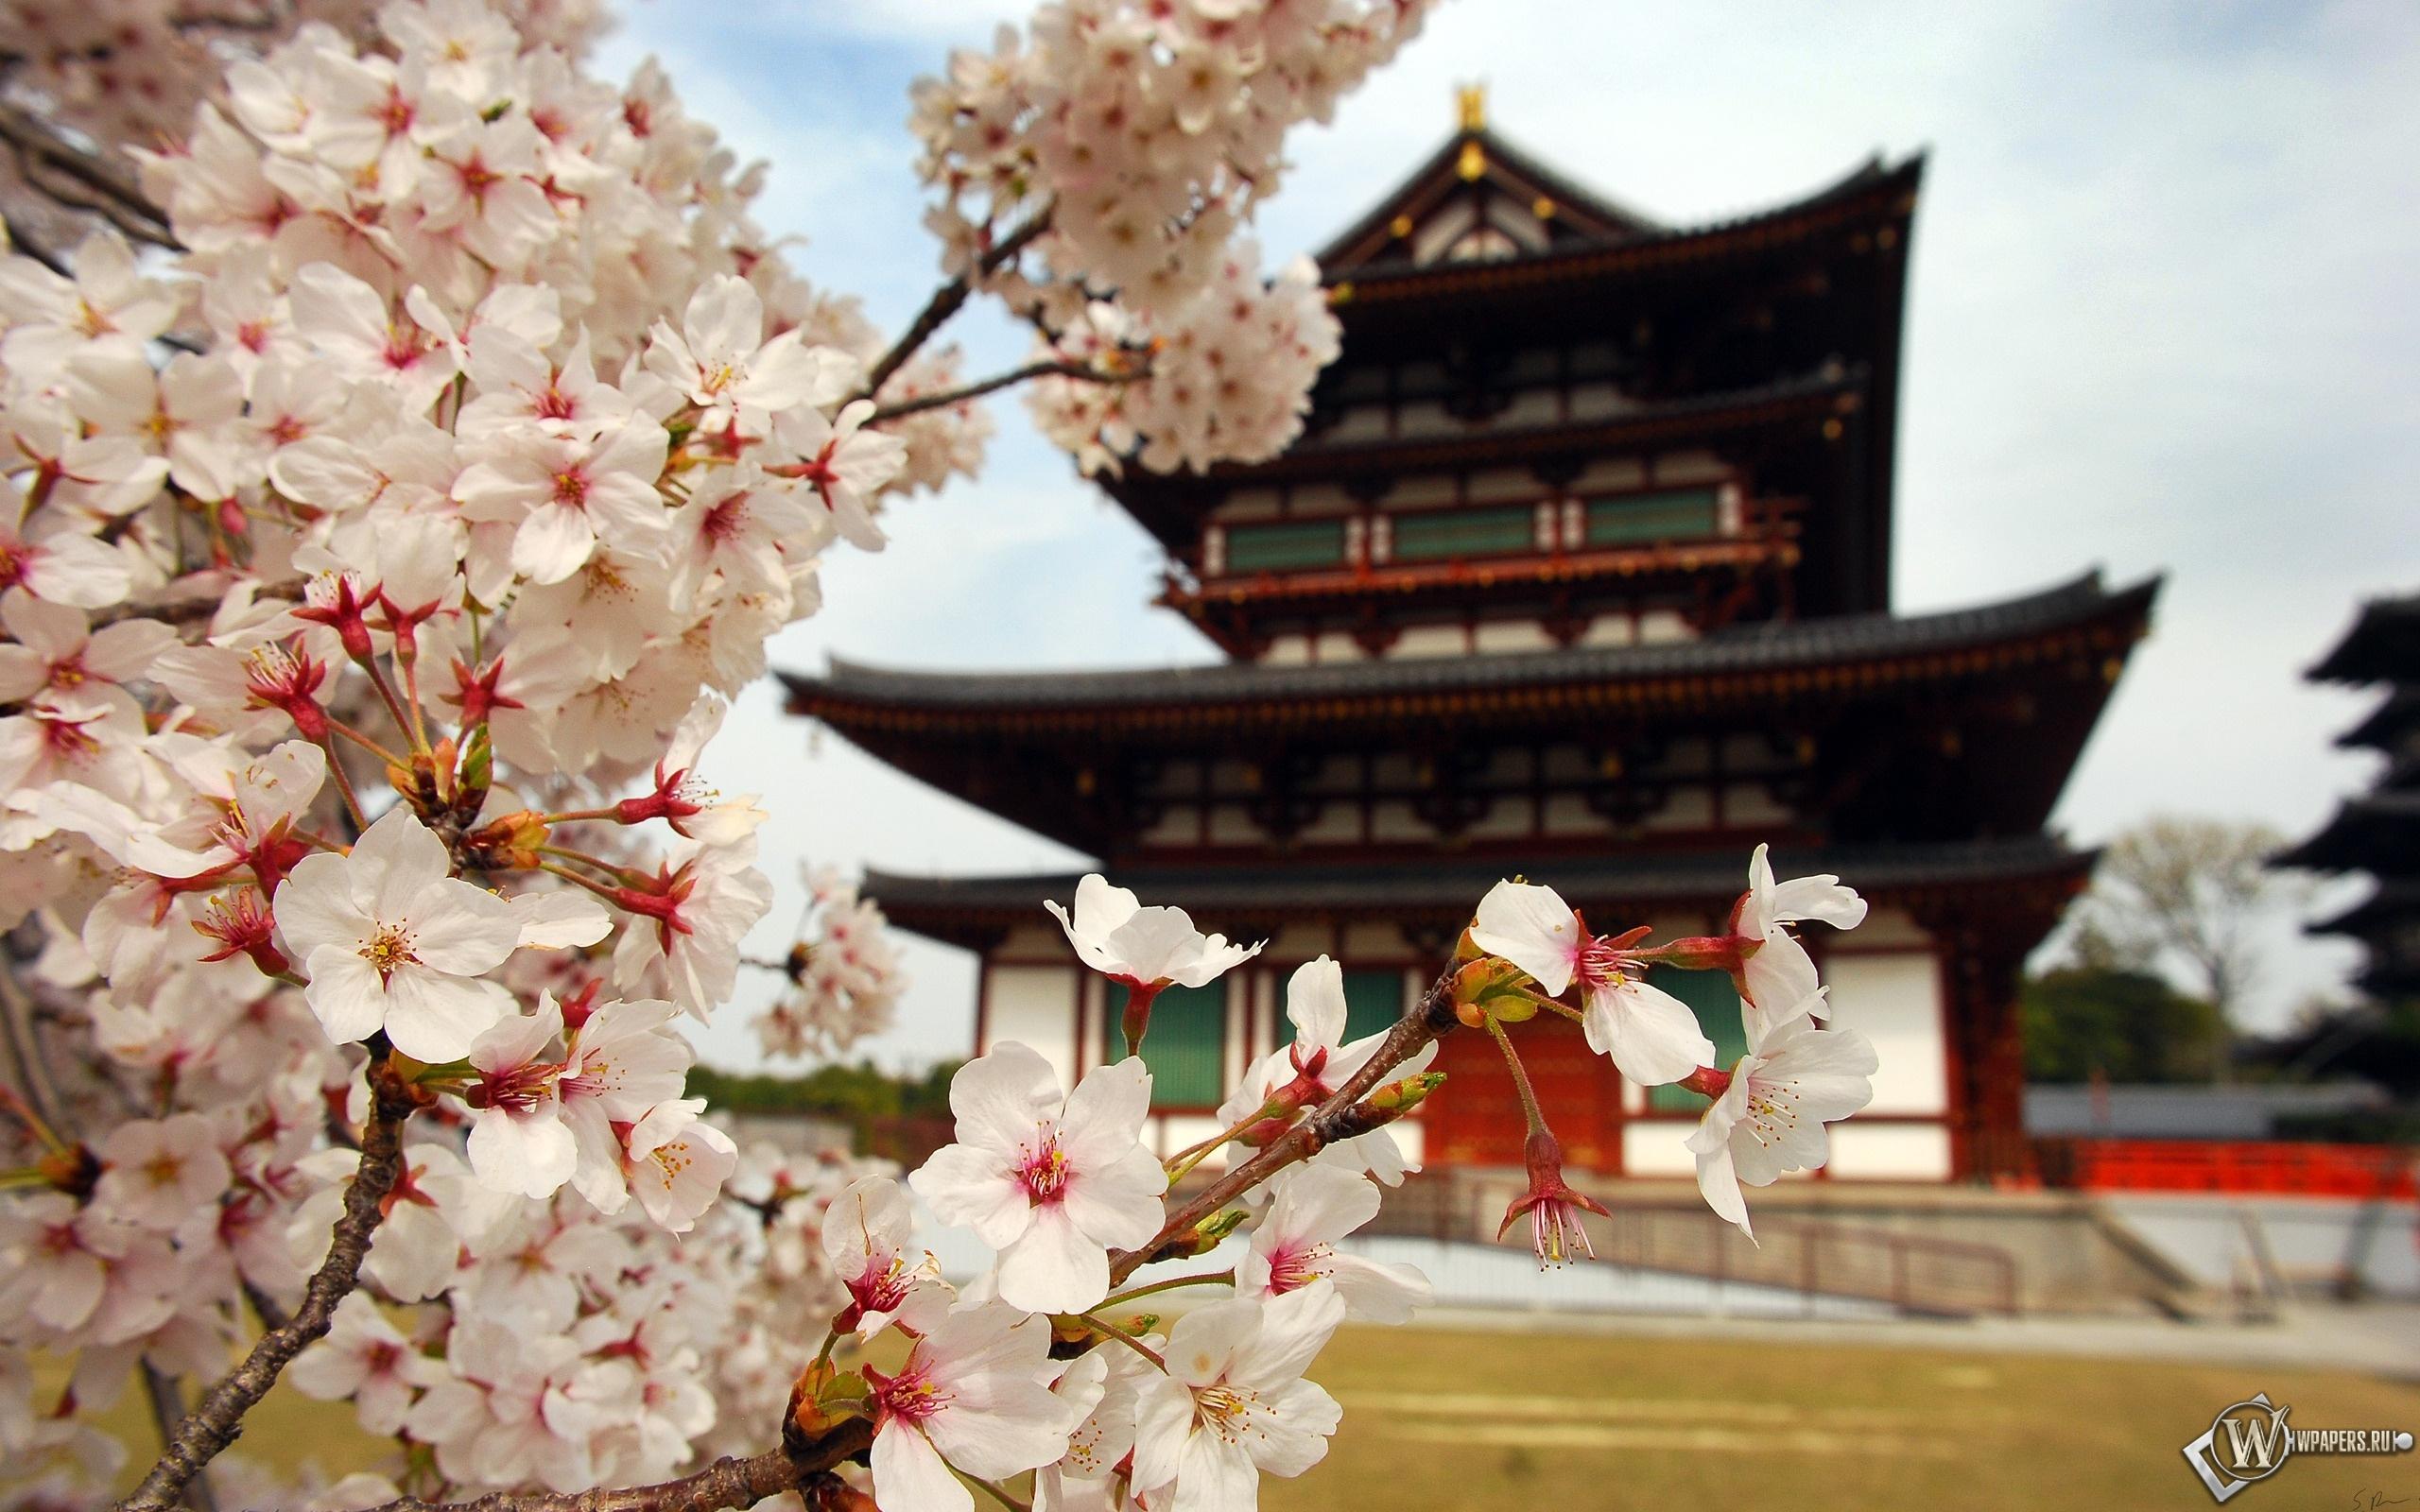 картинка пагода и сакура врачей шерстистом астрагале